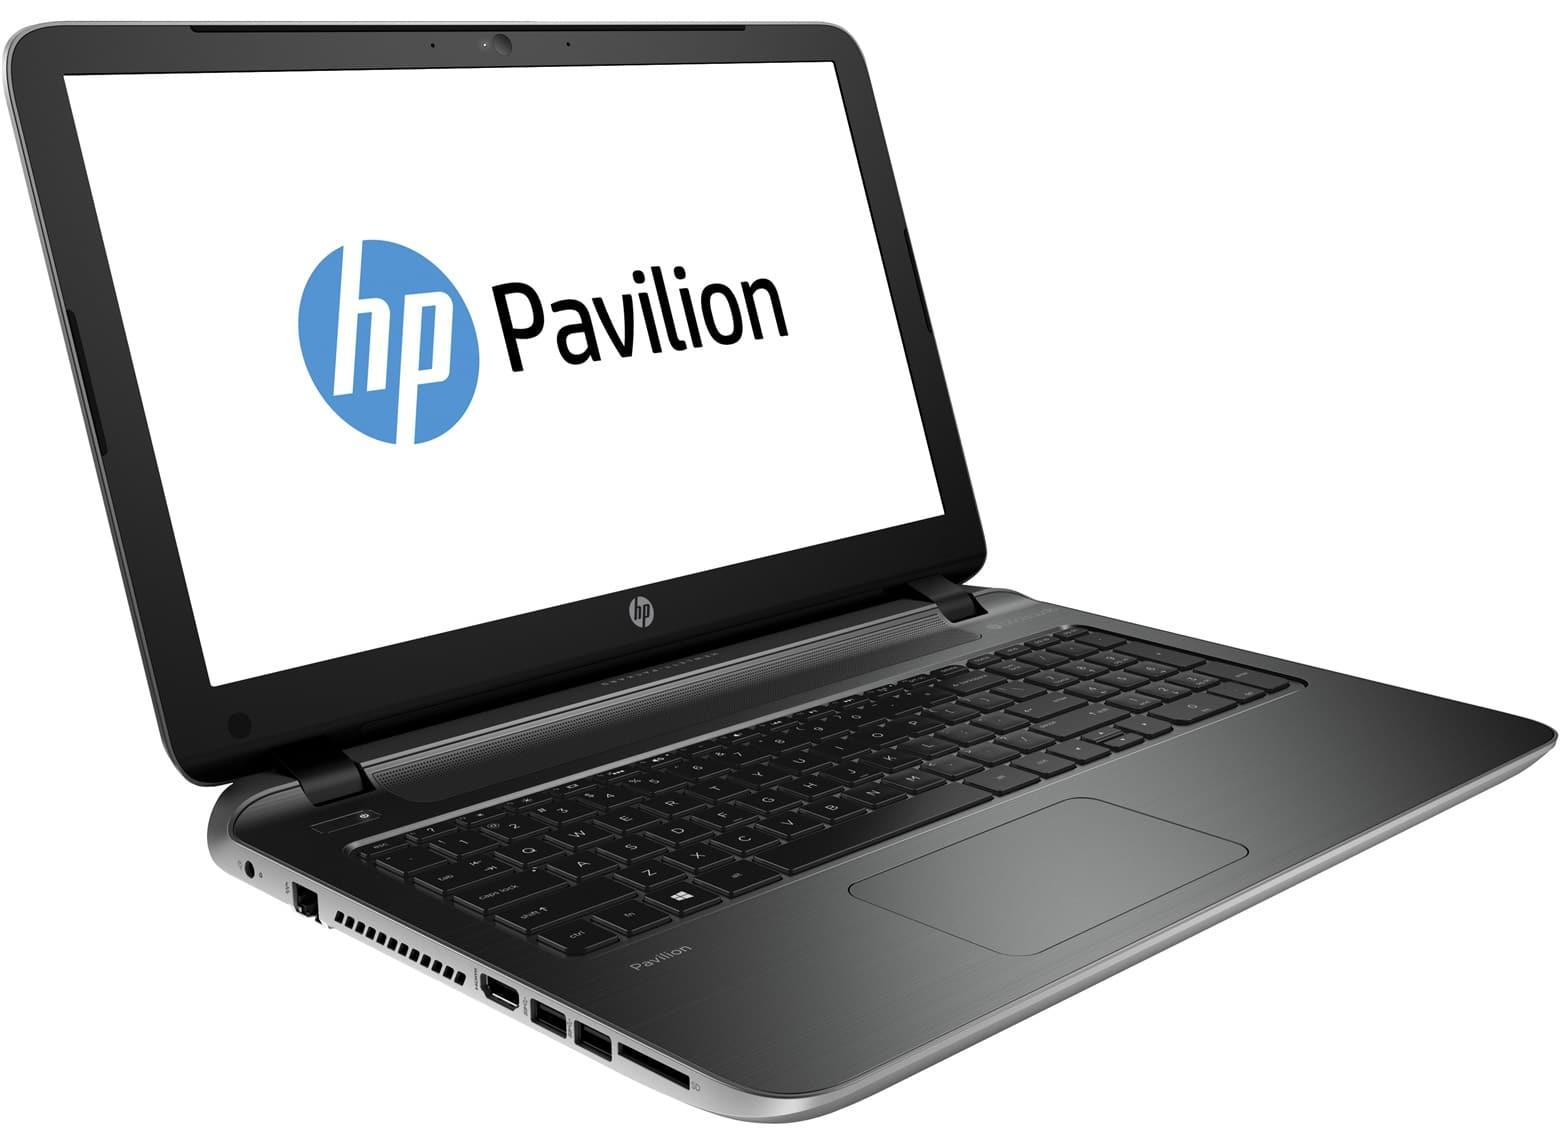 HP Pavilion 15-p005nf 1